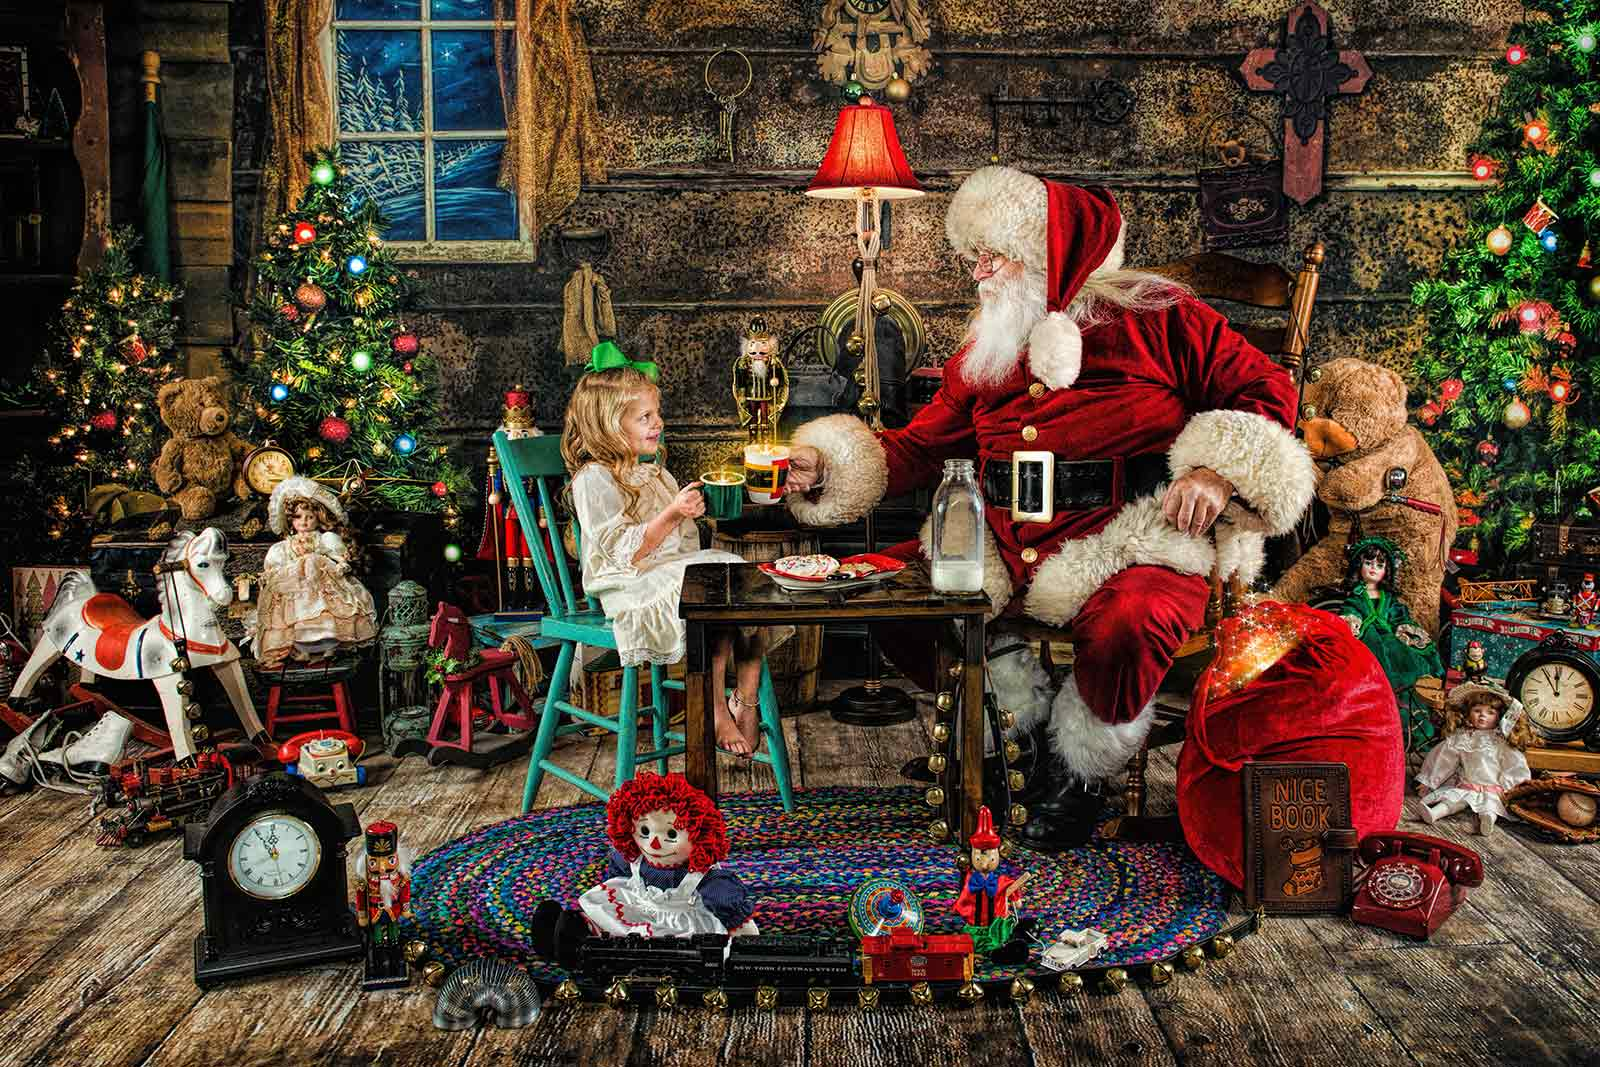 006_Magic-of-Santa-Anna-Thielen-Photography